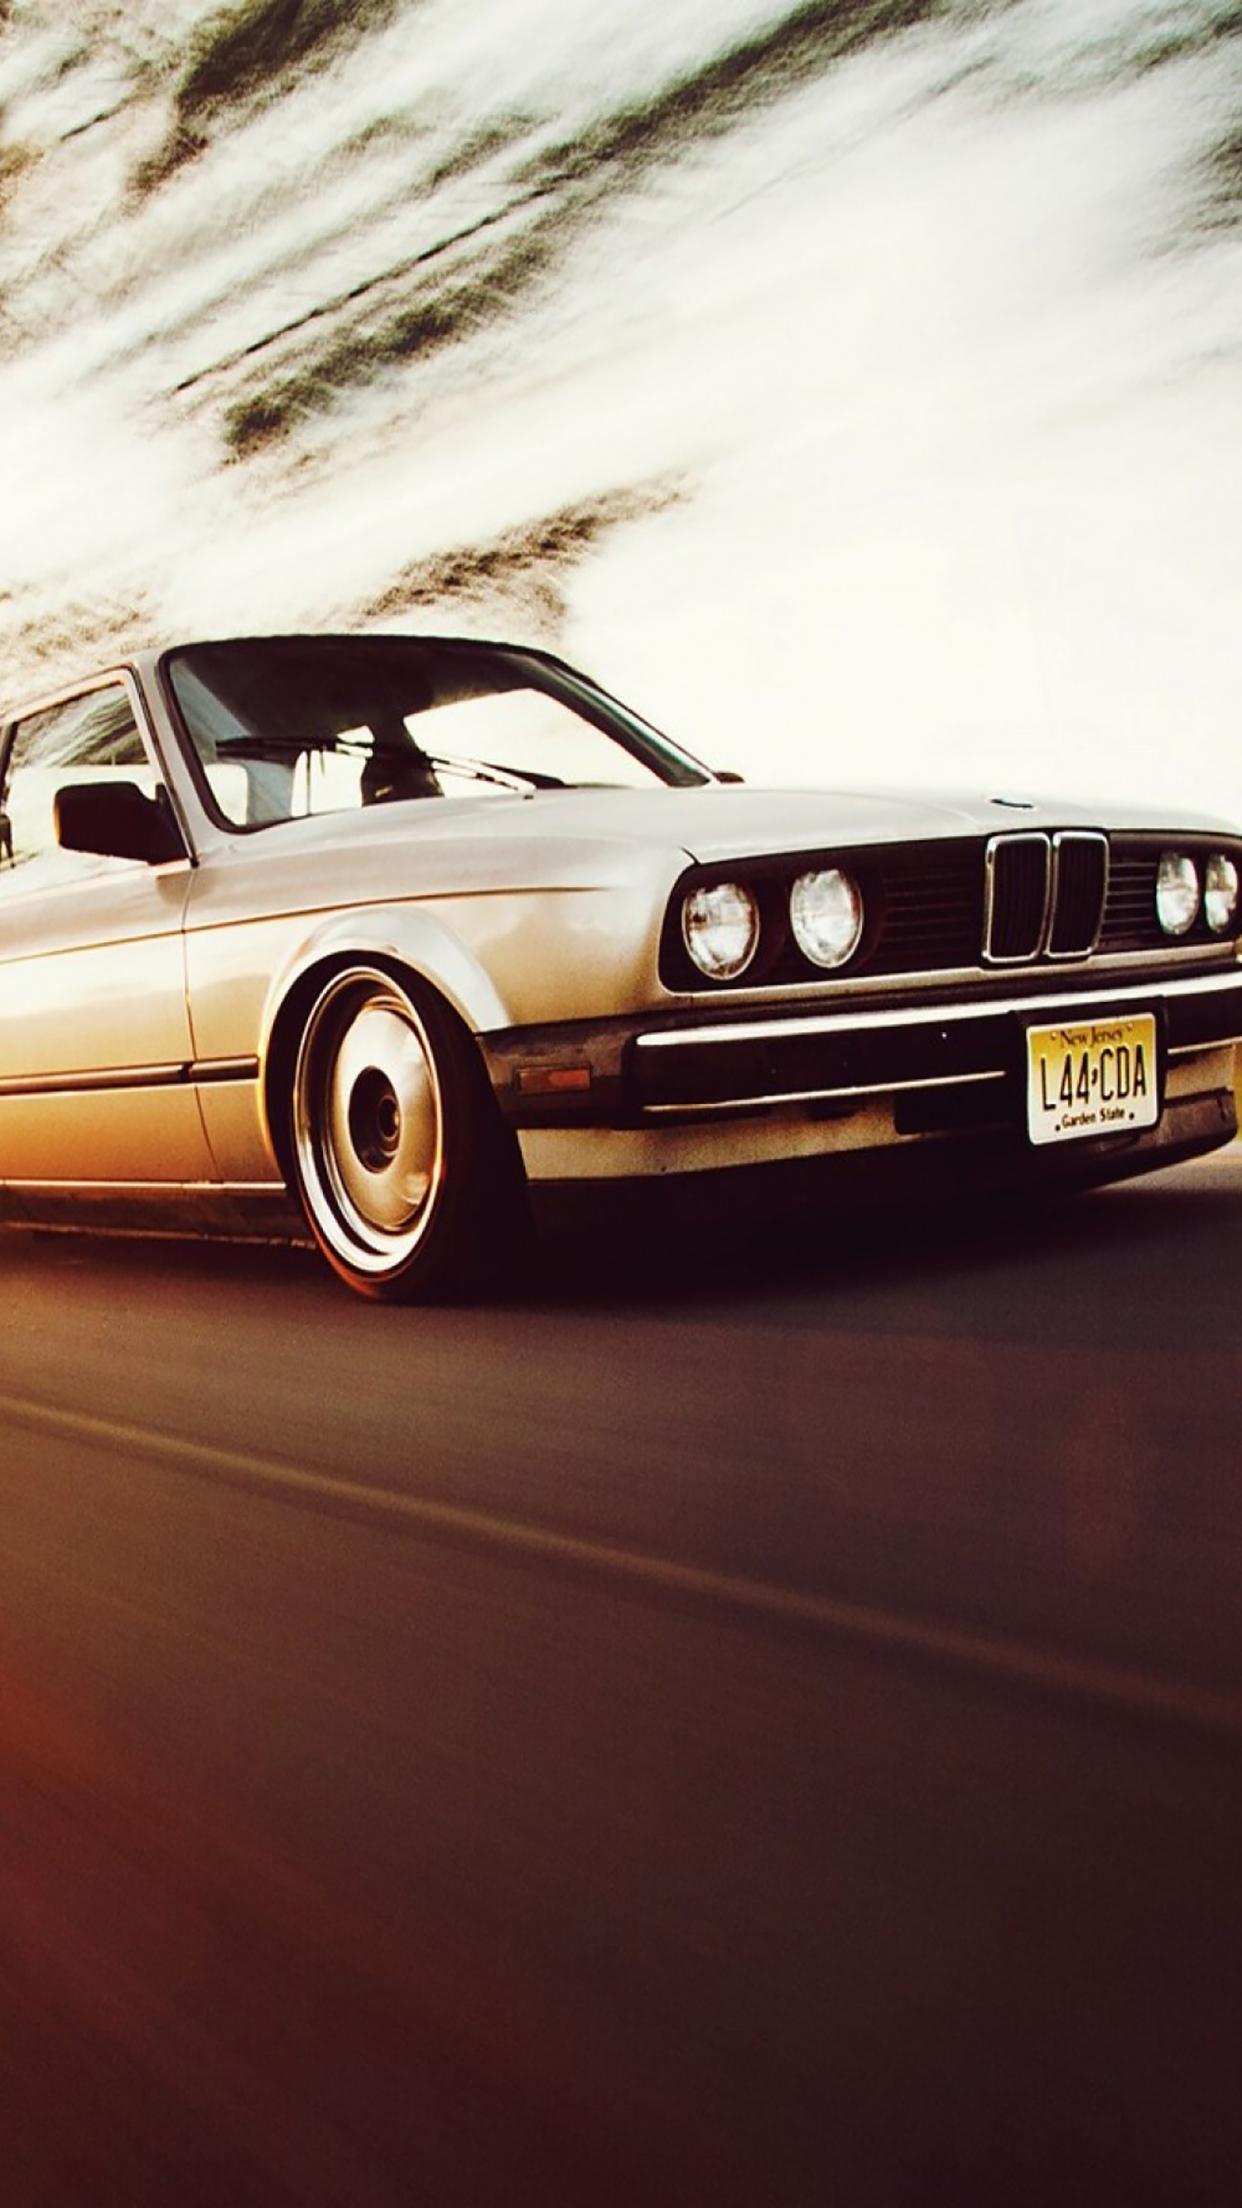 Vintage Cars BMW 3 Series 3Wallpapers iPhone Parallax Vintage Cars BMW 3 Series